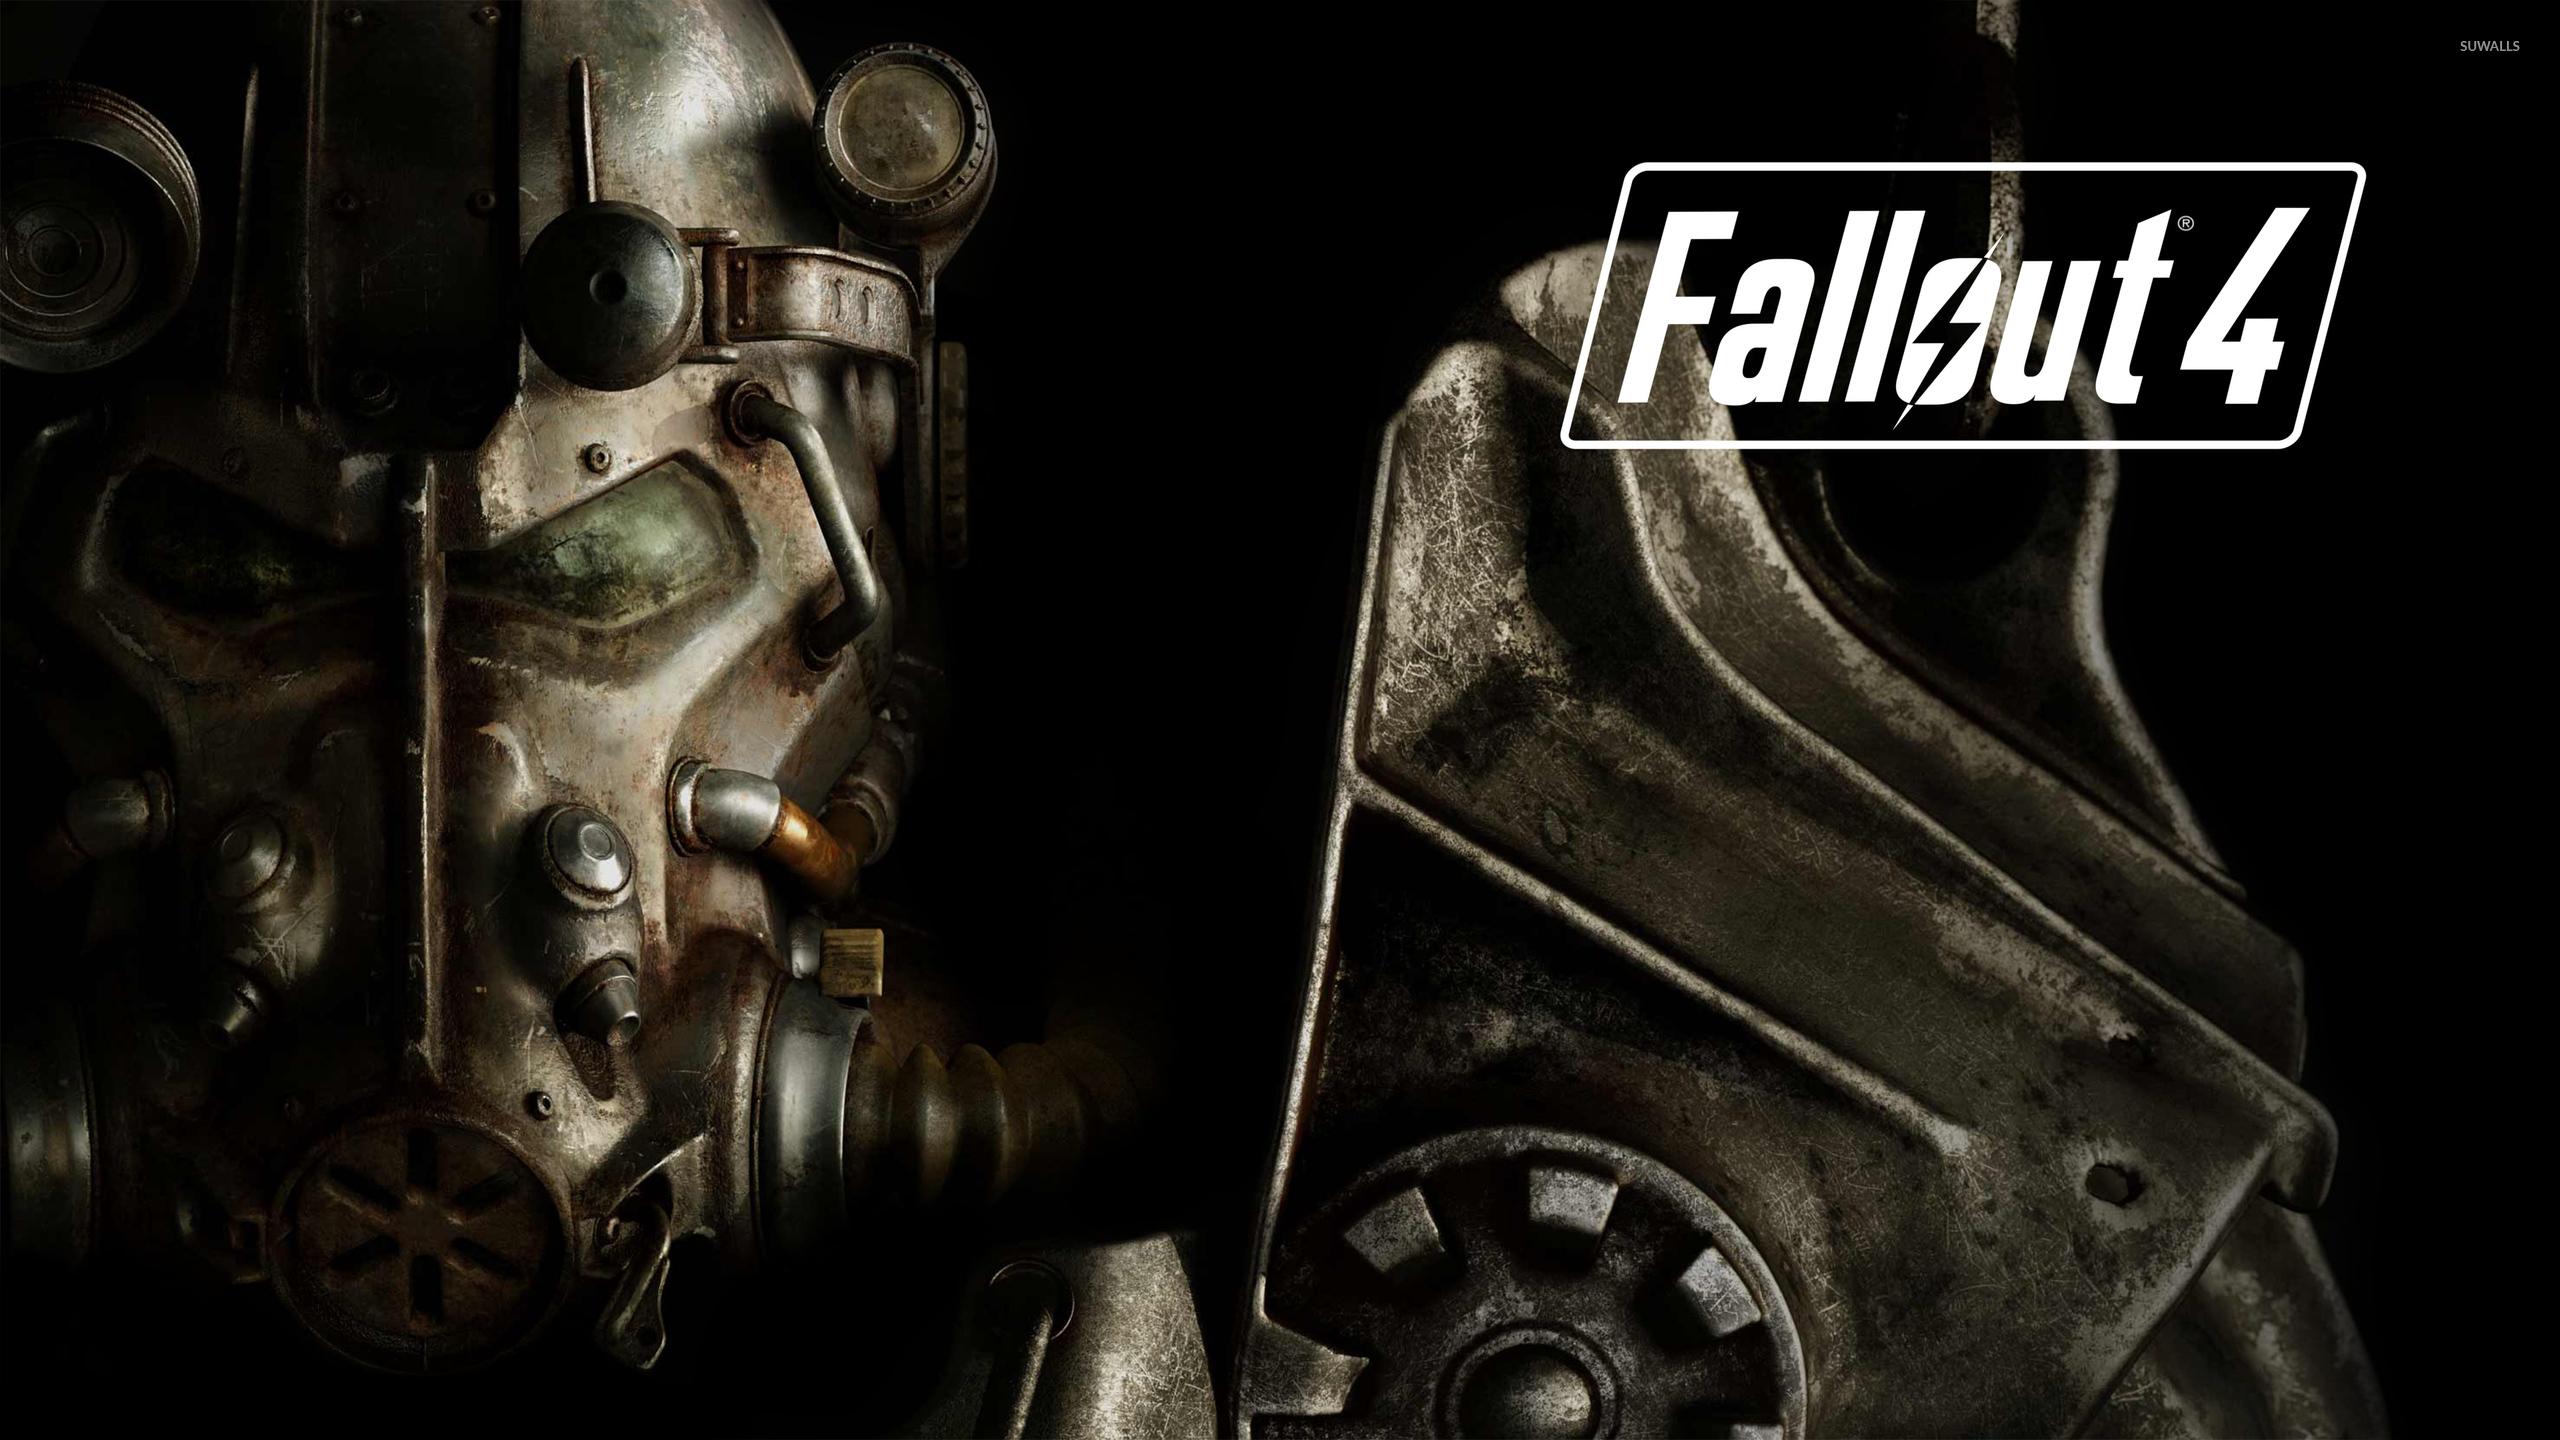 Fallout 4 Armor Wallpaper